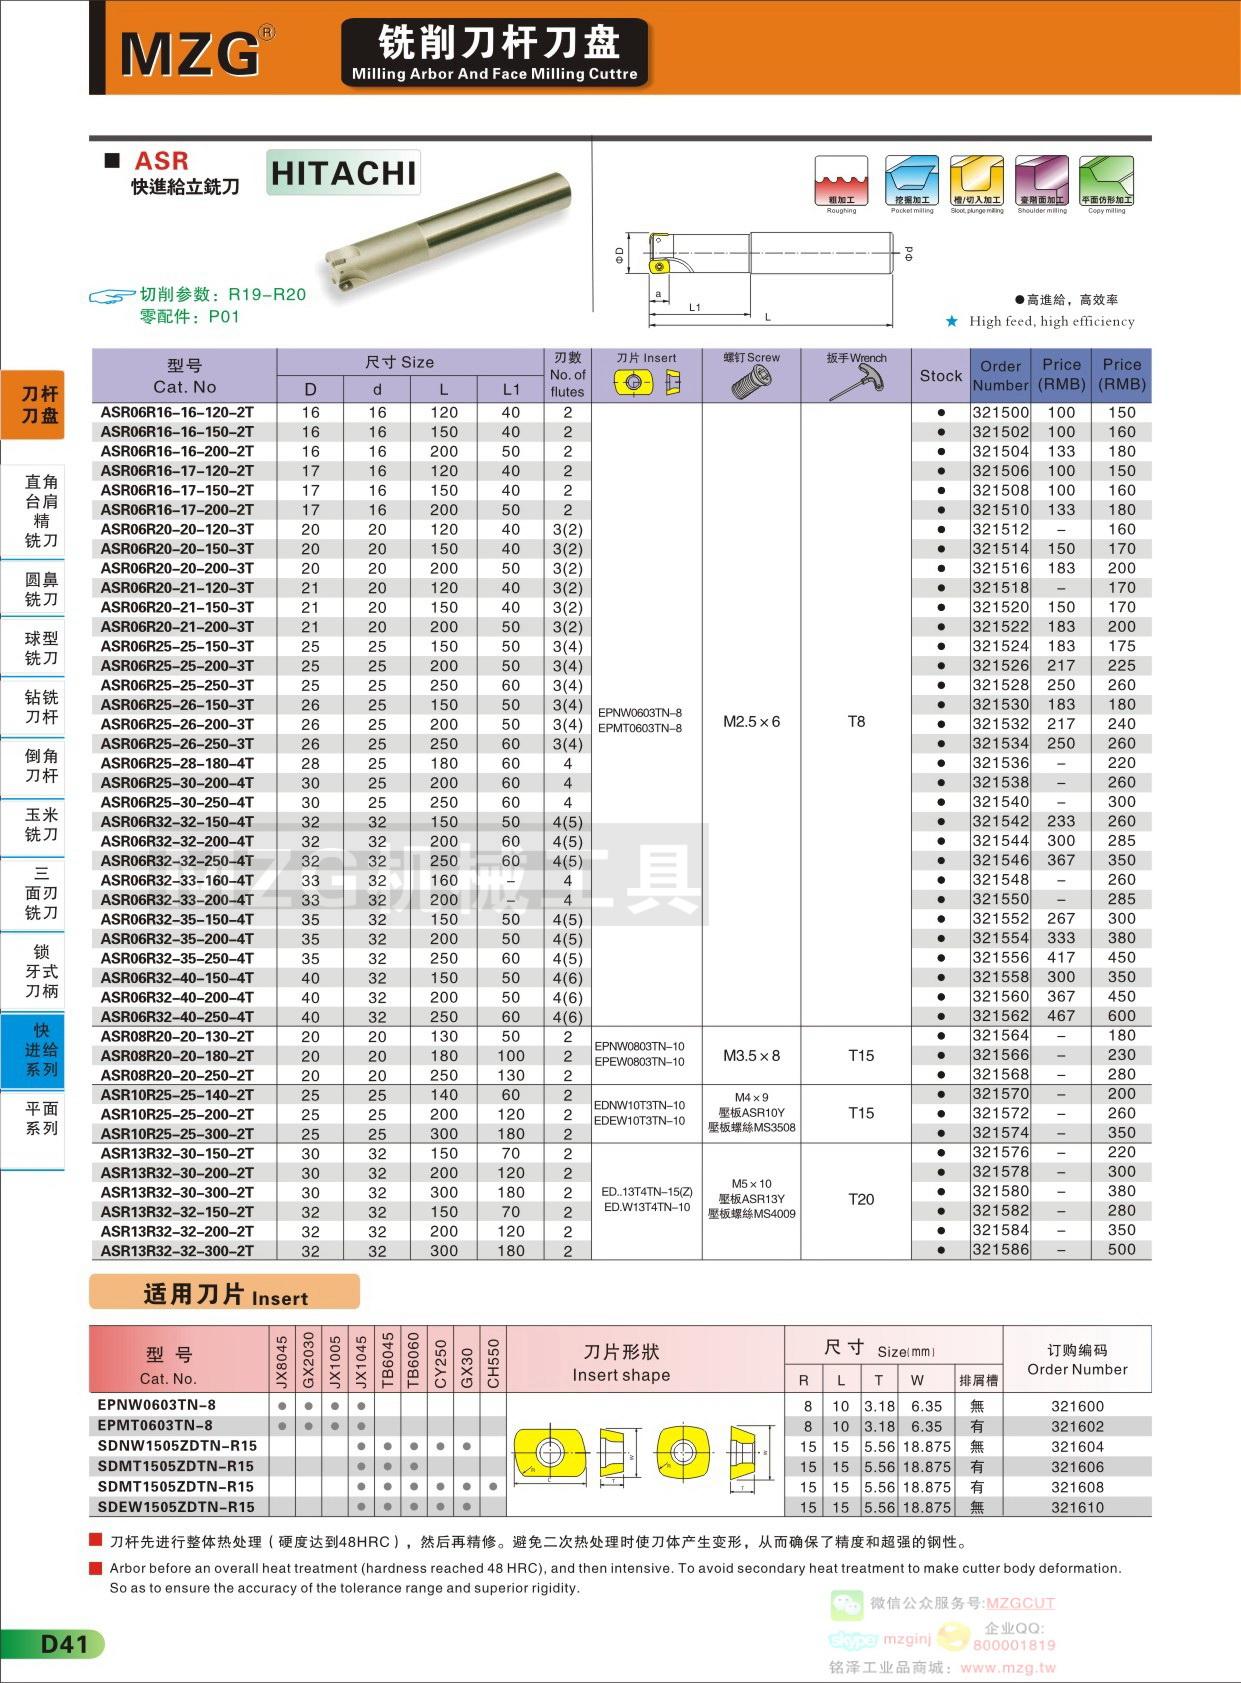 MZG品牌2015D41MZG铣削刀杆,ASR快进给立铣刀杆,装EPNW06,EPMT06,EPNW08,EPEW08,EDNW10,EDEW10,EDNW13,EDEW13日立快进给刀片